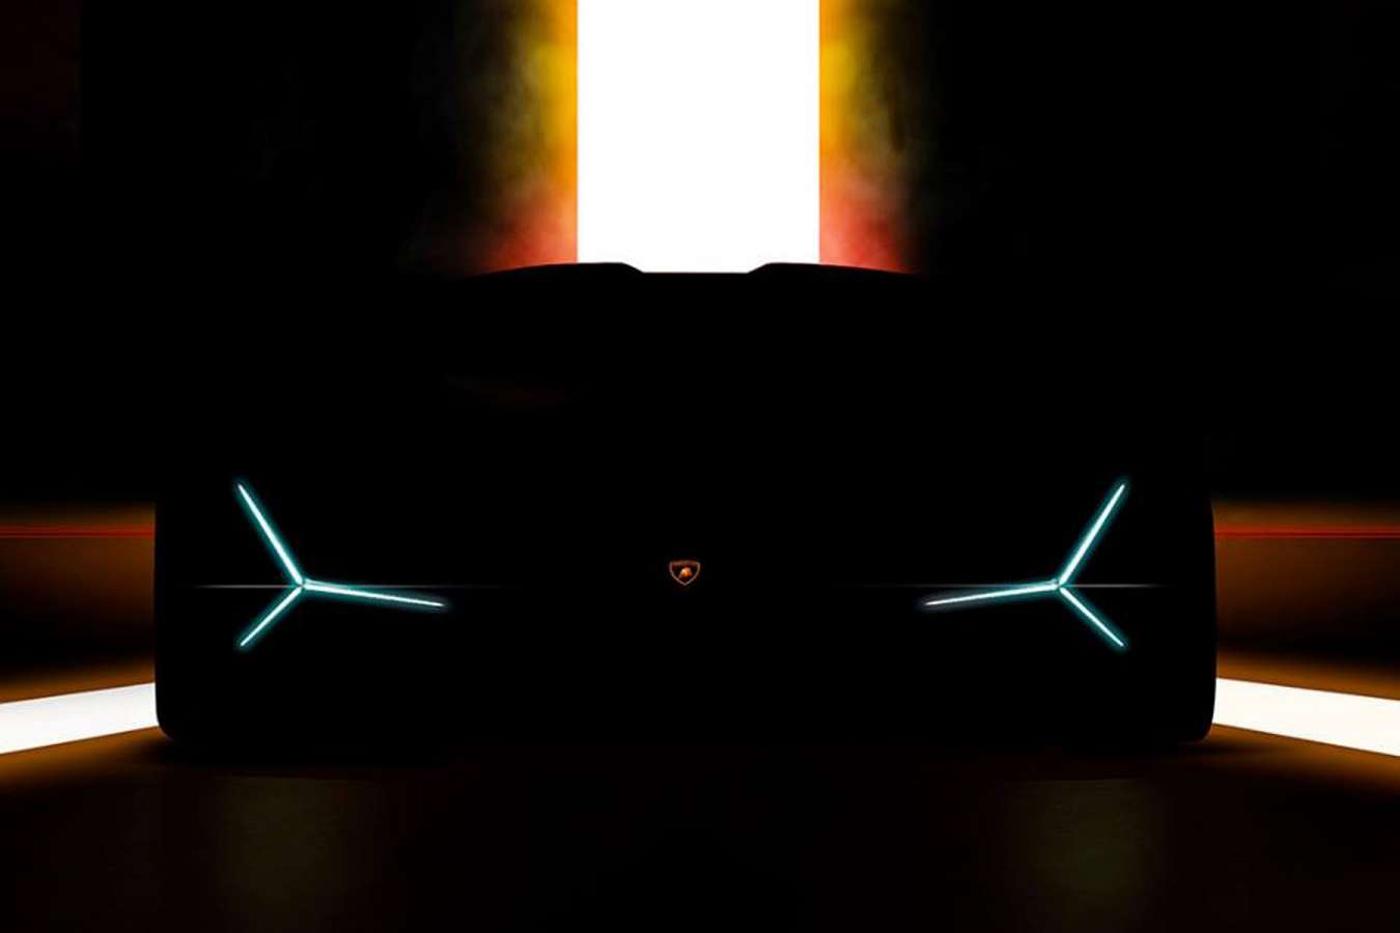 Lamborghini : une hypercar hybride de 800 ch en approche ?